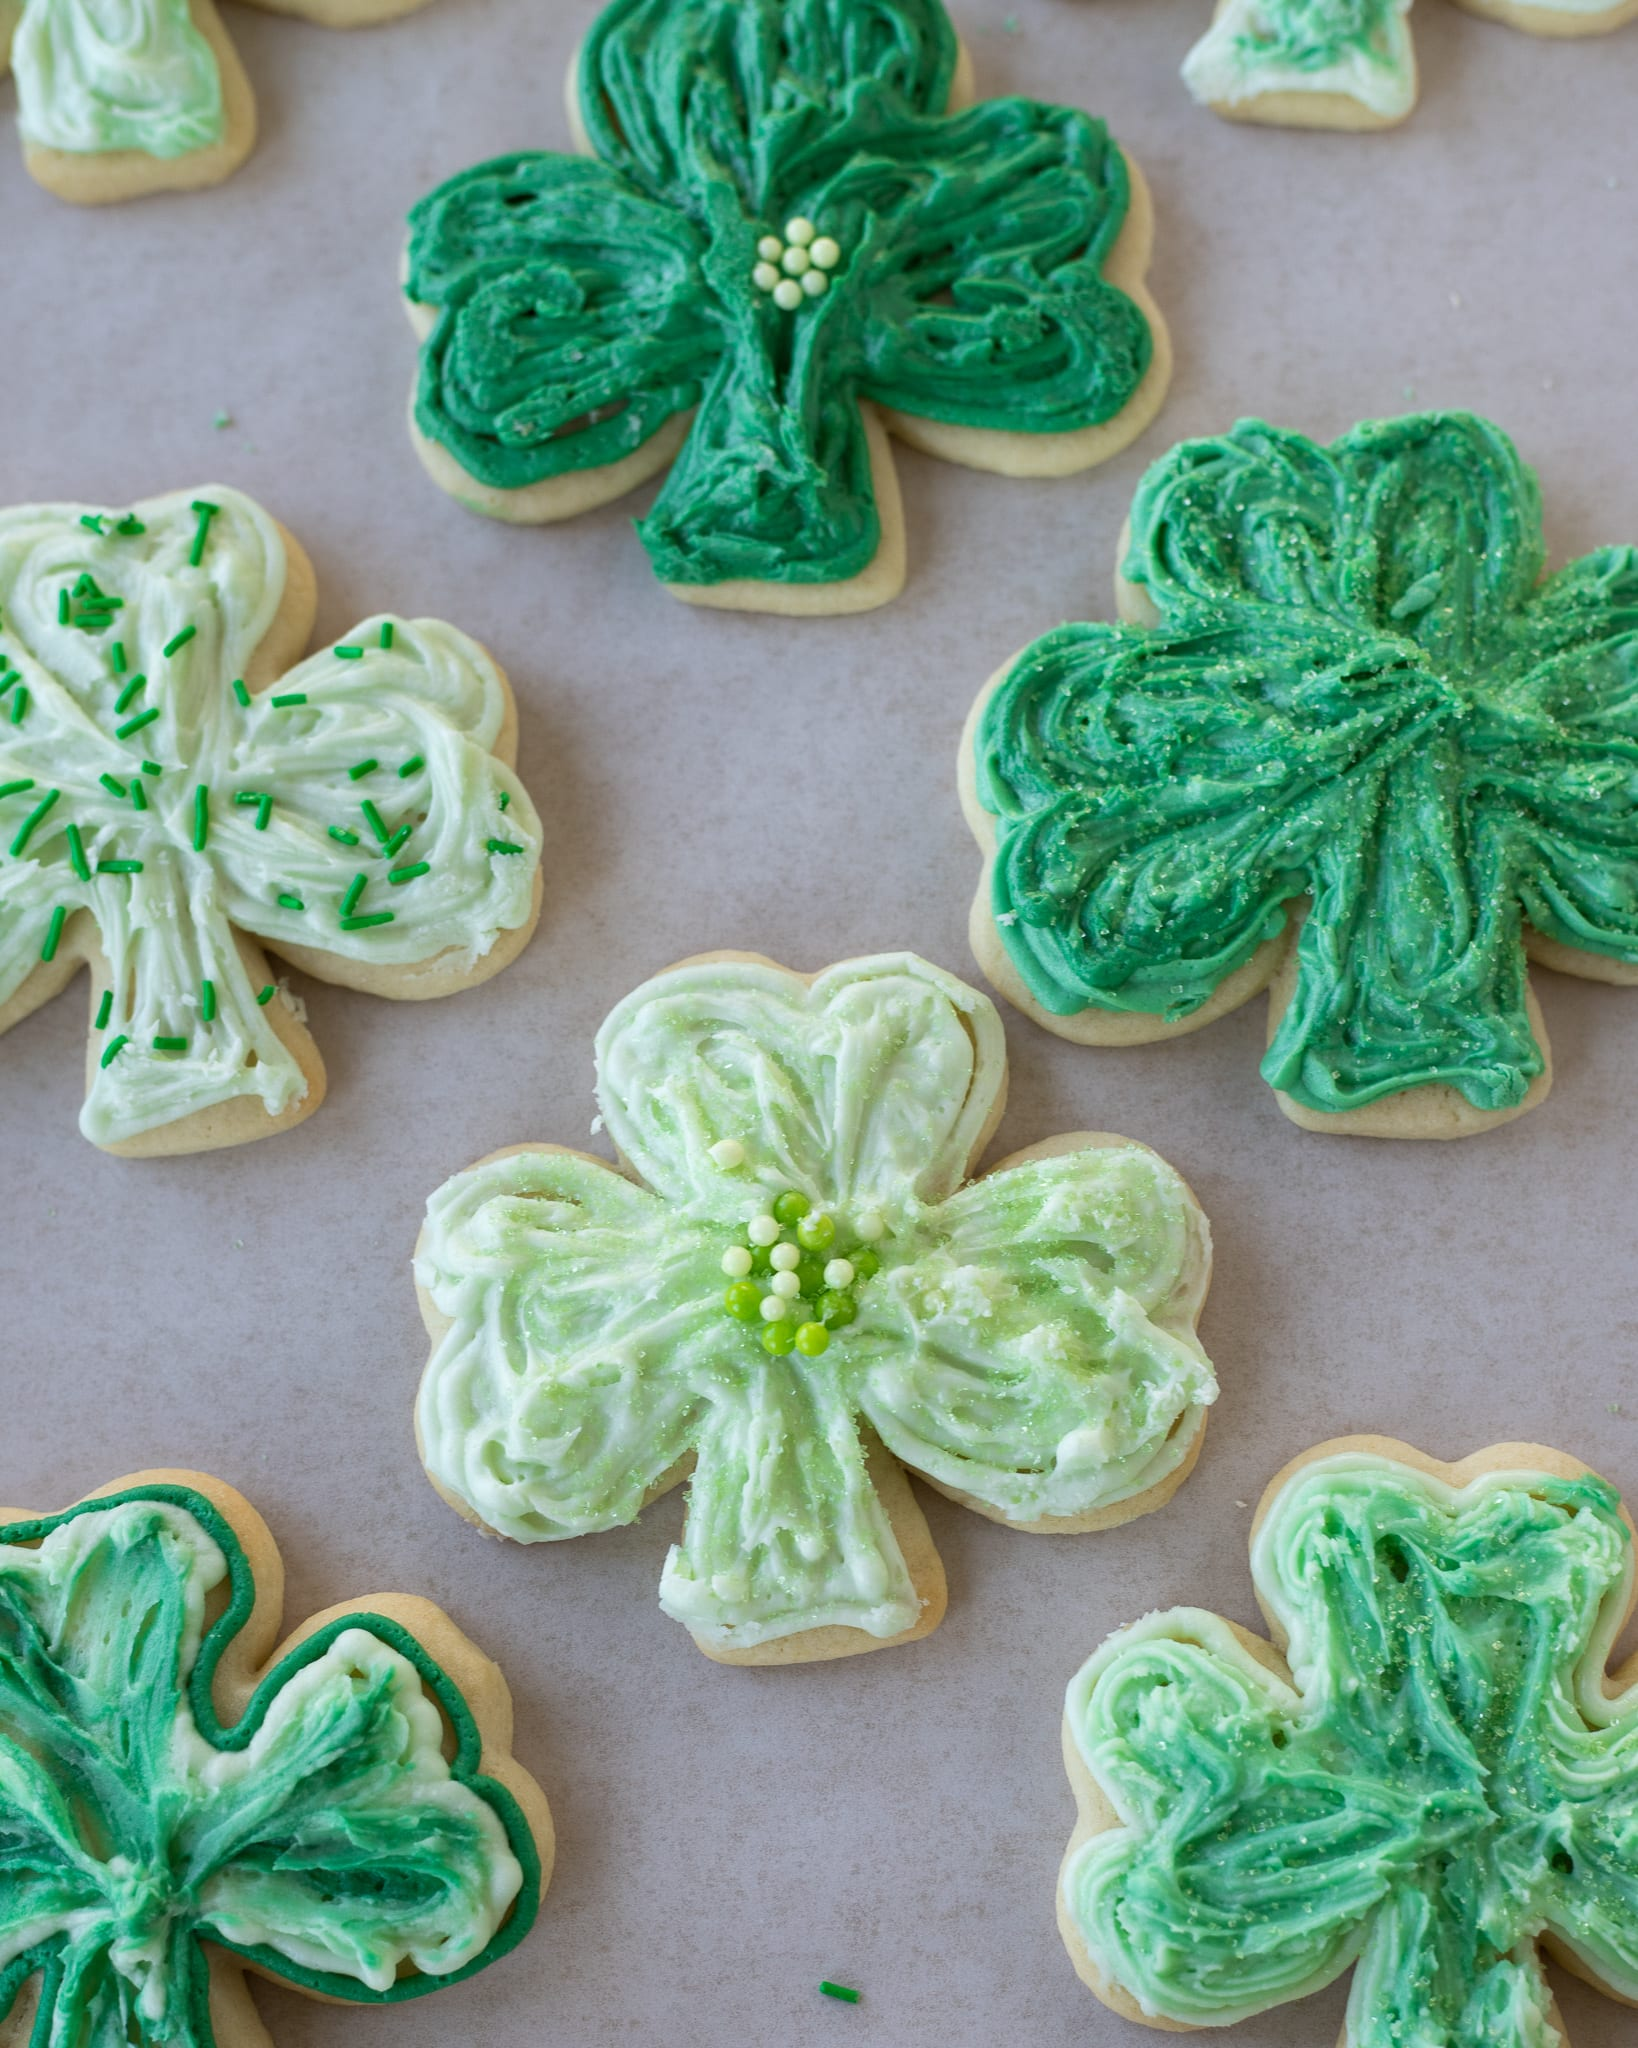 shamrock sugar cookies sugar cookie recipe baking frosting st. patricks day saint patrick's day celebration green cookies